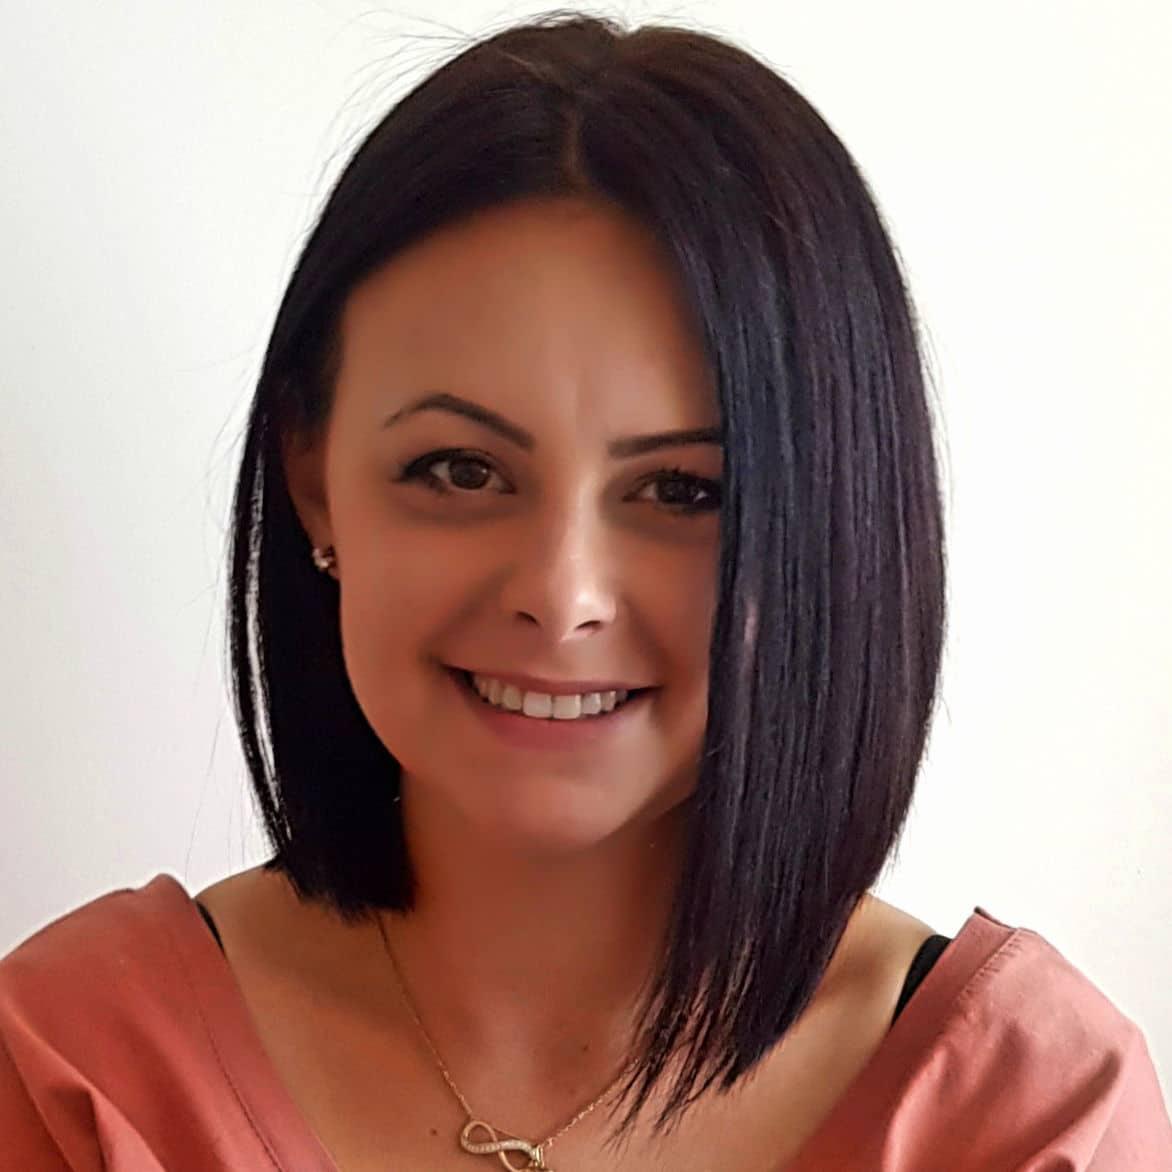 Malgorzata Borowiecka